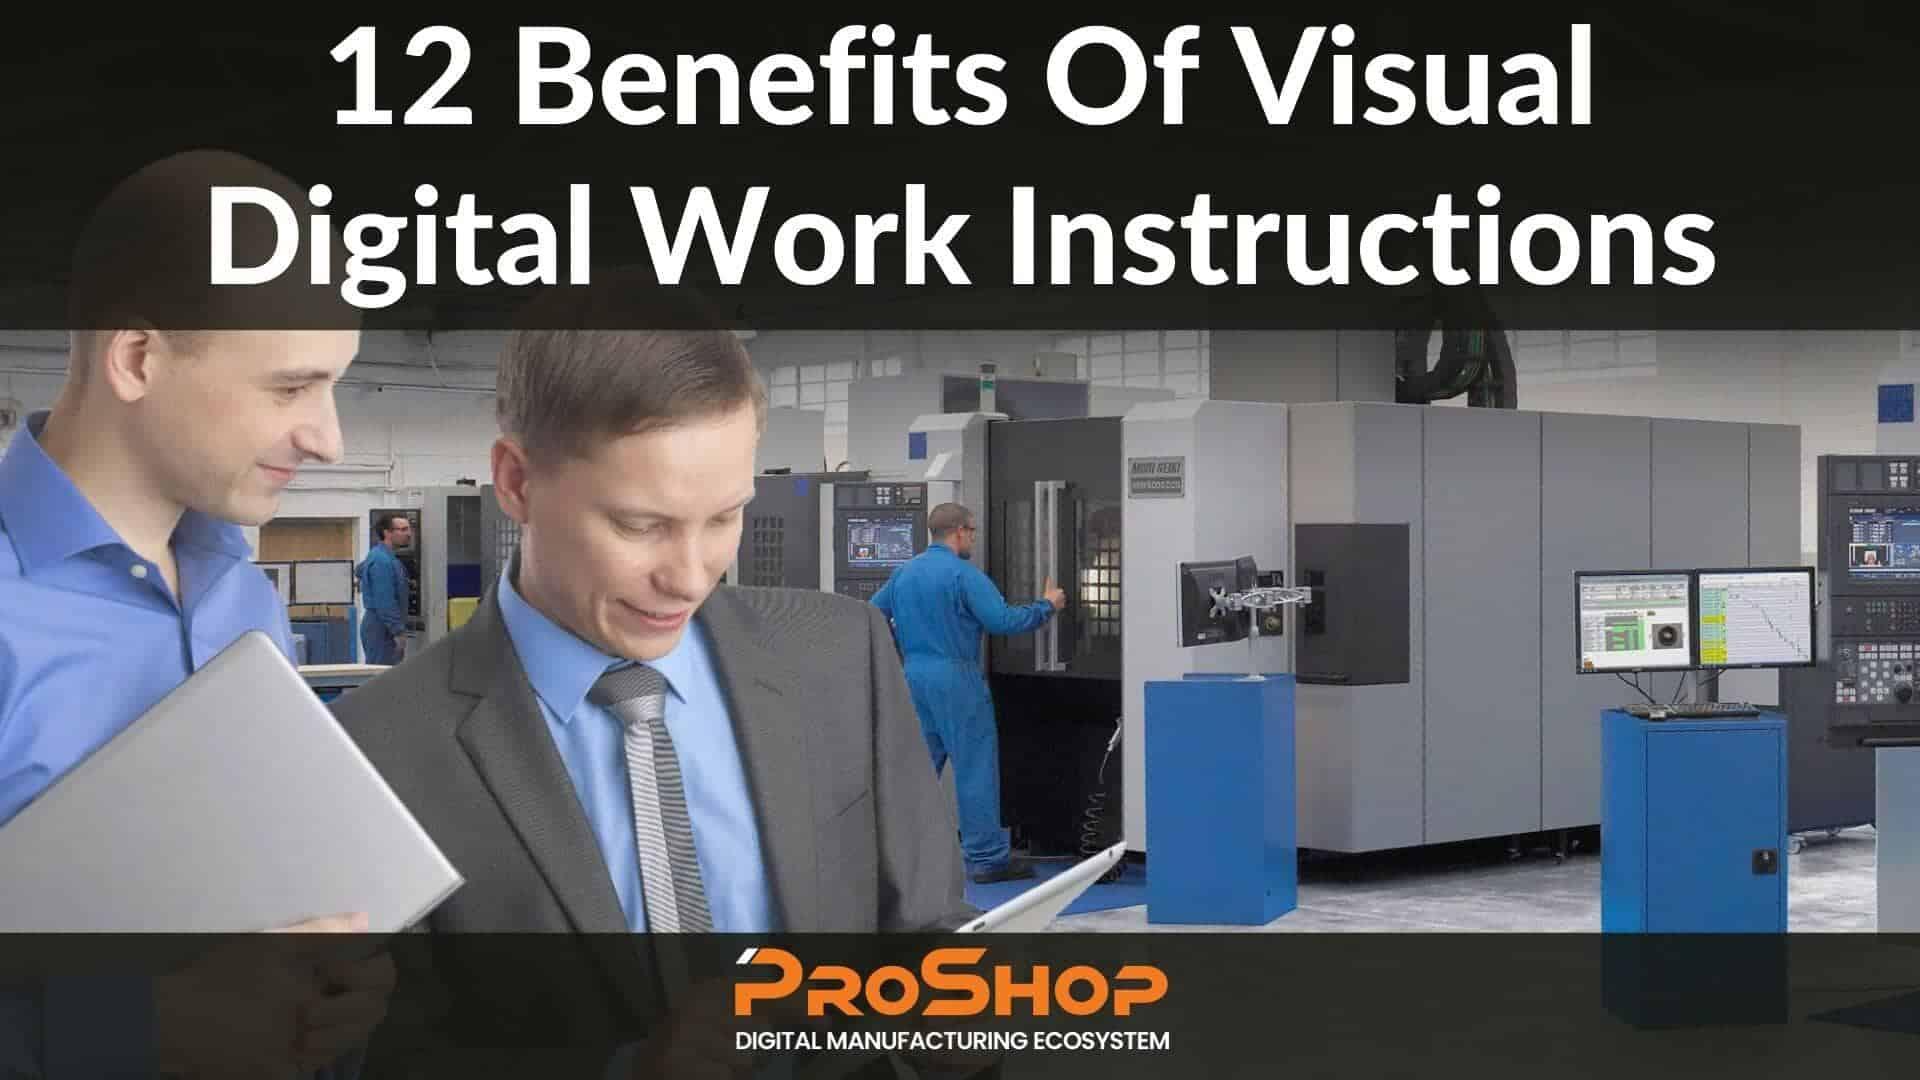 Benefits Of Visual Digital Work Instructions